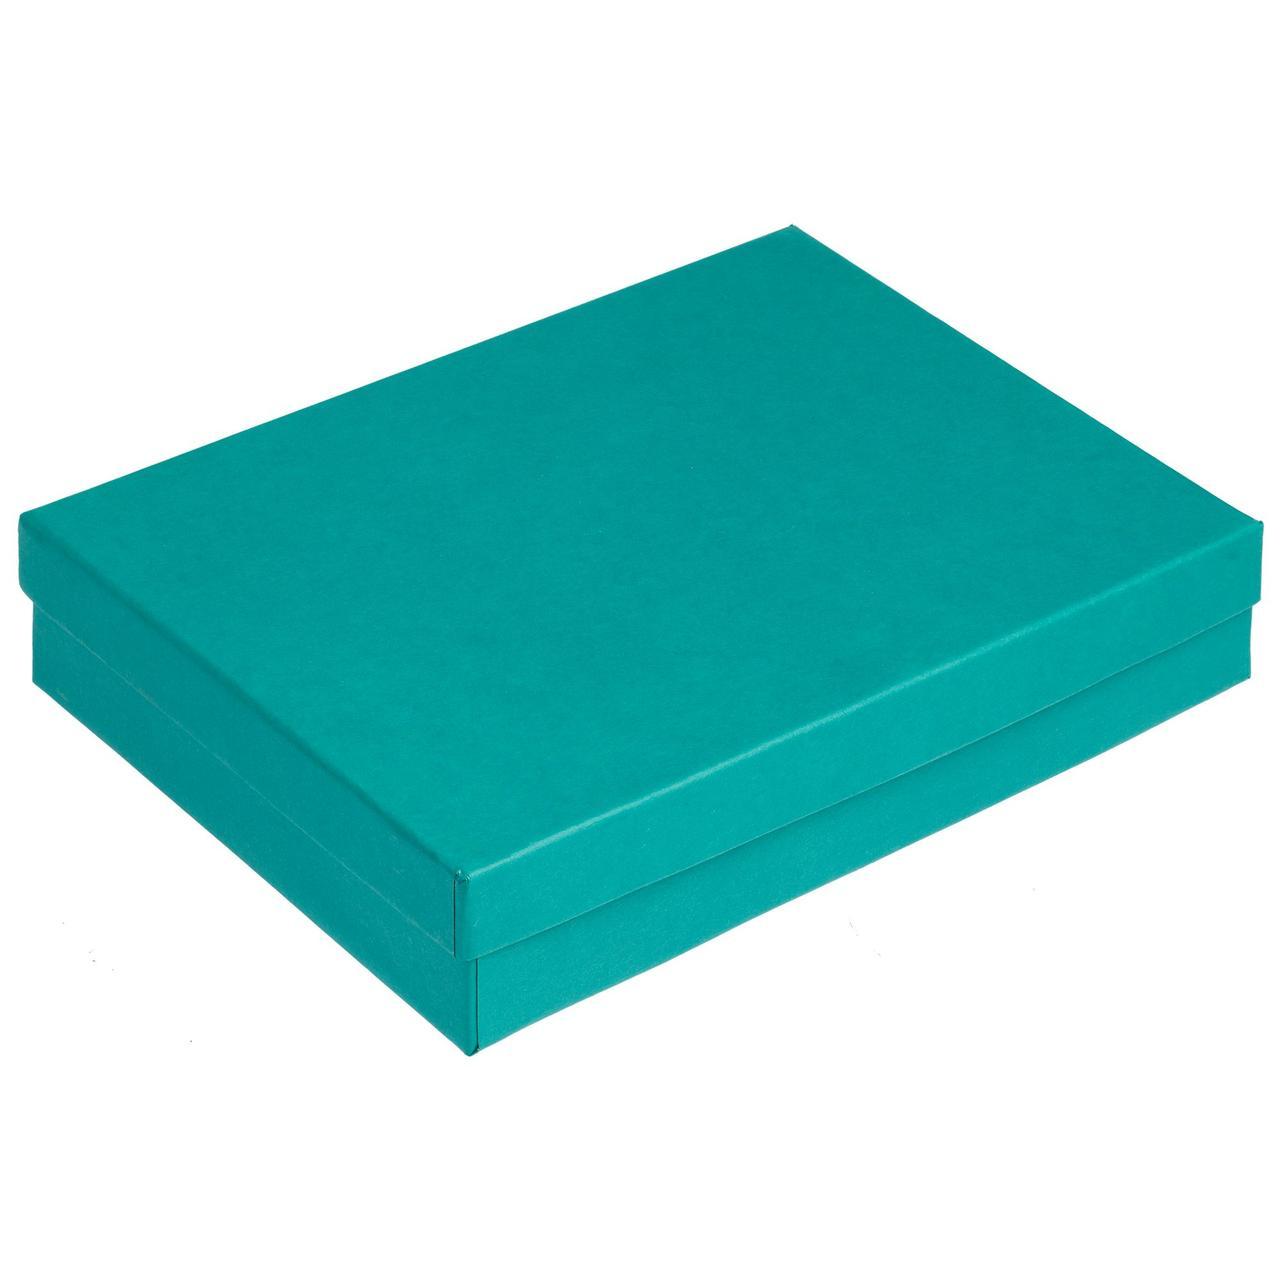 Коробка Reason, бирюзовая (артикул 7067.14)